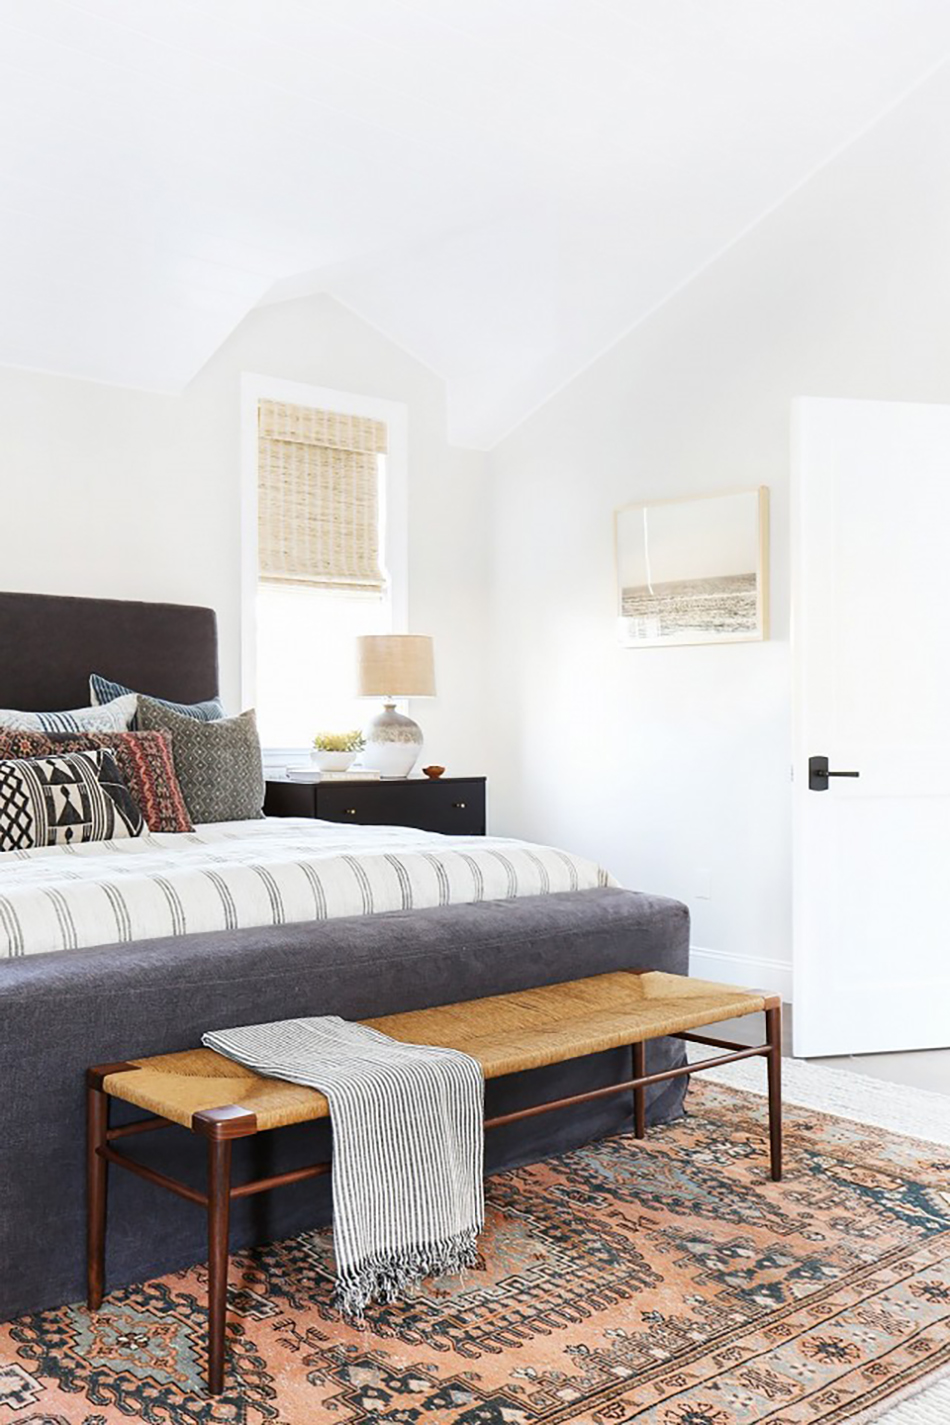 Modern Boho Interiors - Colorful, Layered and Modern Spaces on Boho Modern Decor  id=40100